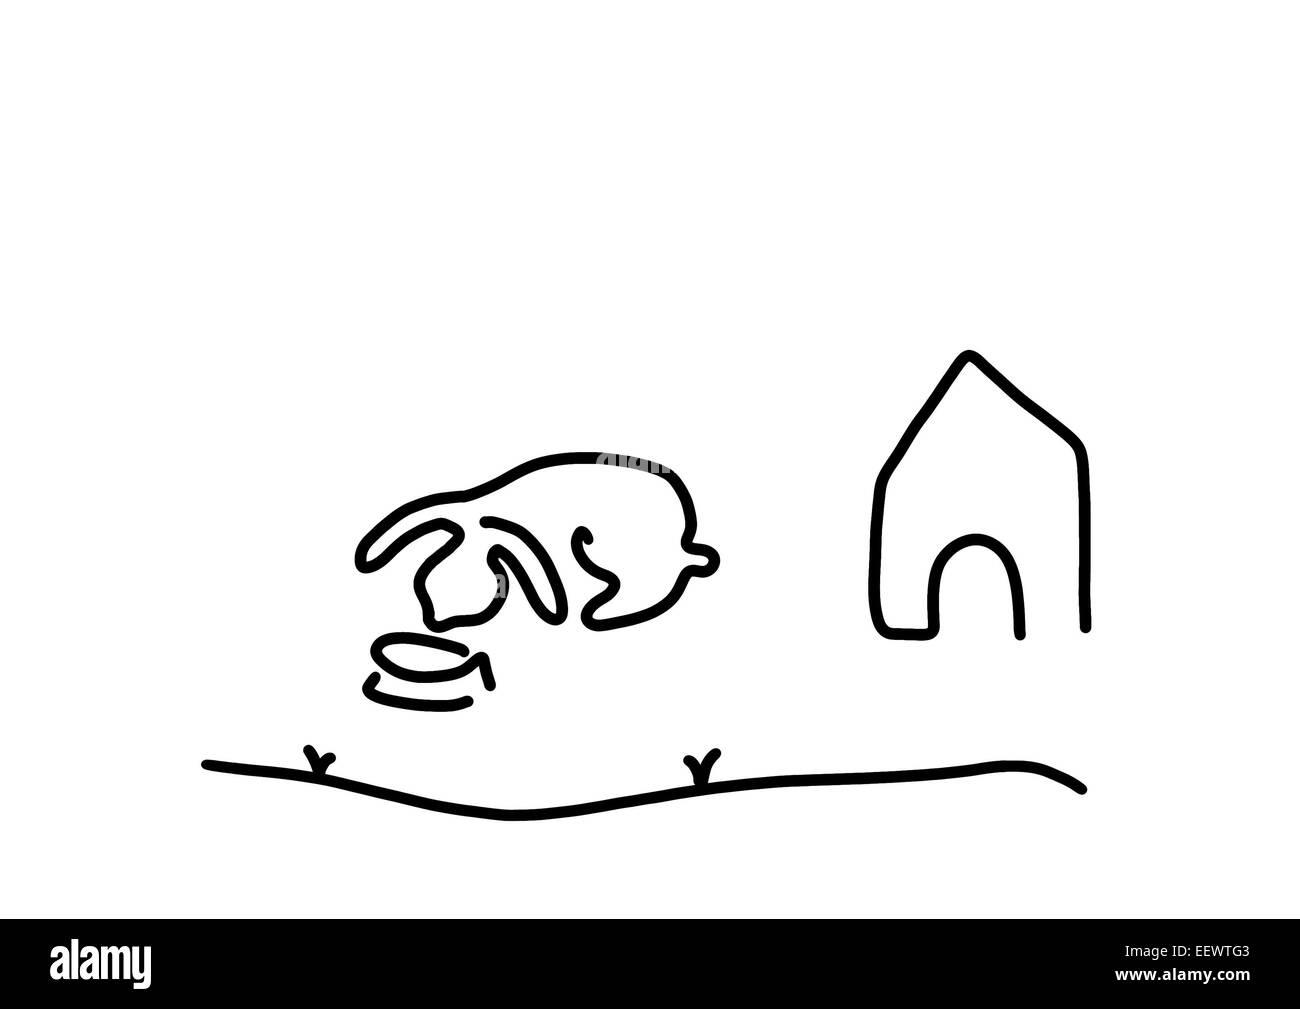 Haustier Kaninchen Hase Stockfoto Bild 78014723 Alamy